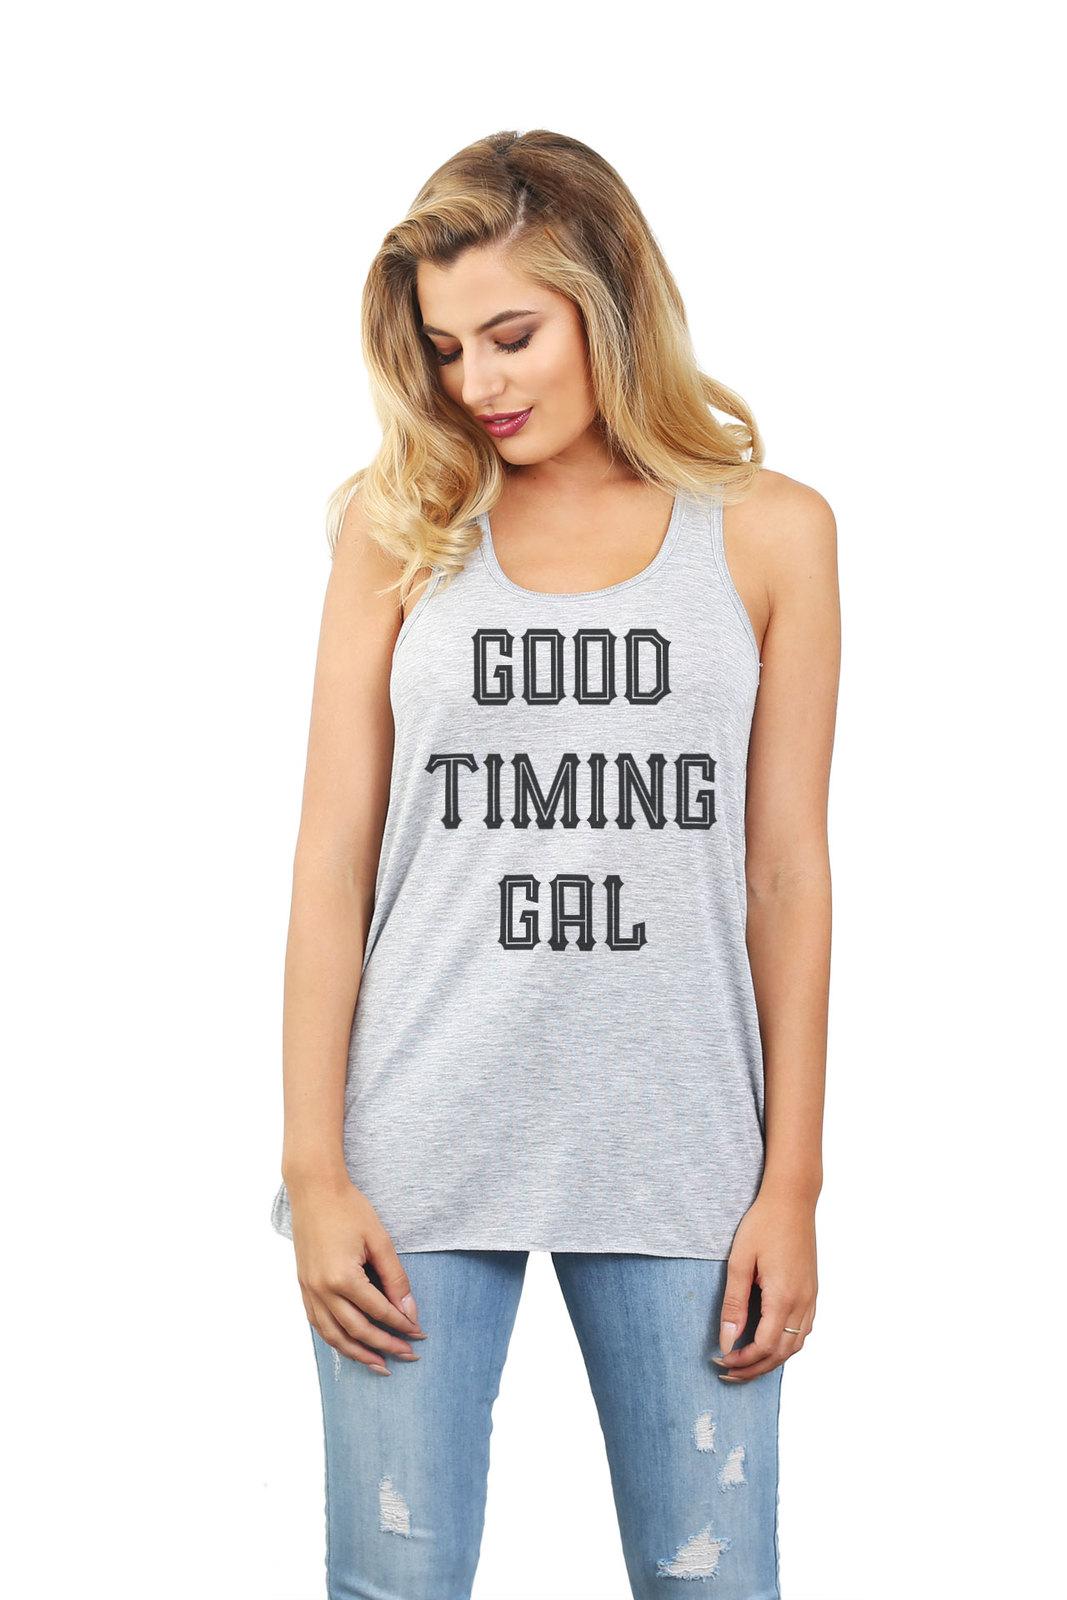 Thread Tank Good Timing Gal Women's Sleeveless Flowy Racerback Tank Top Sport Gr